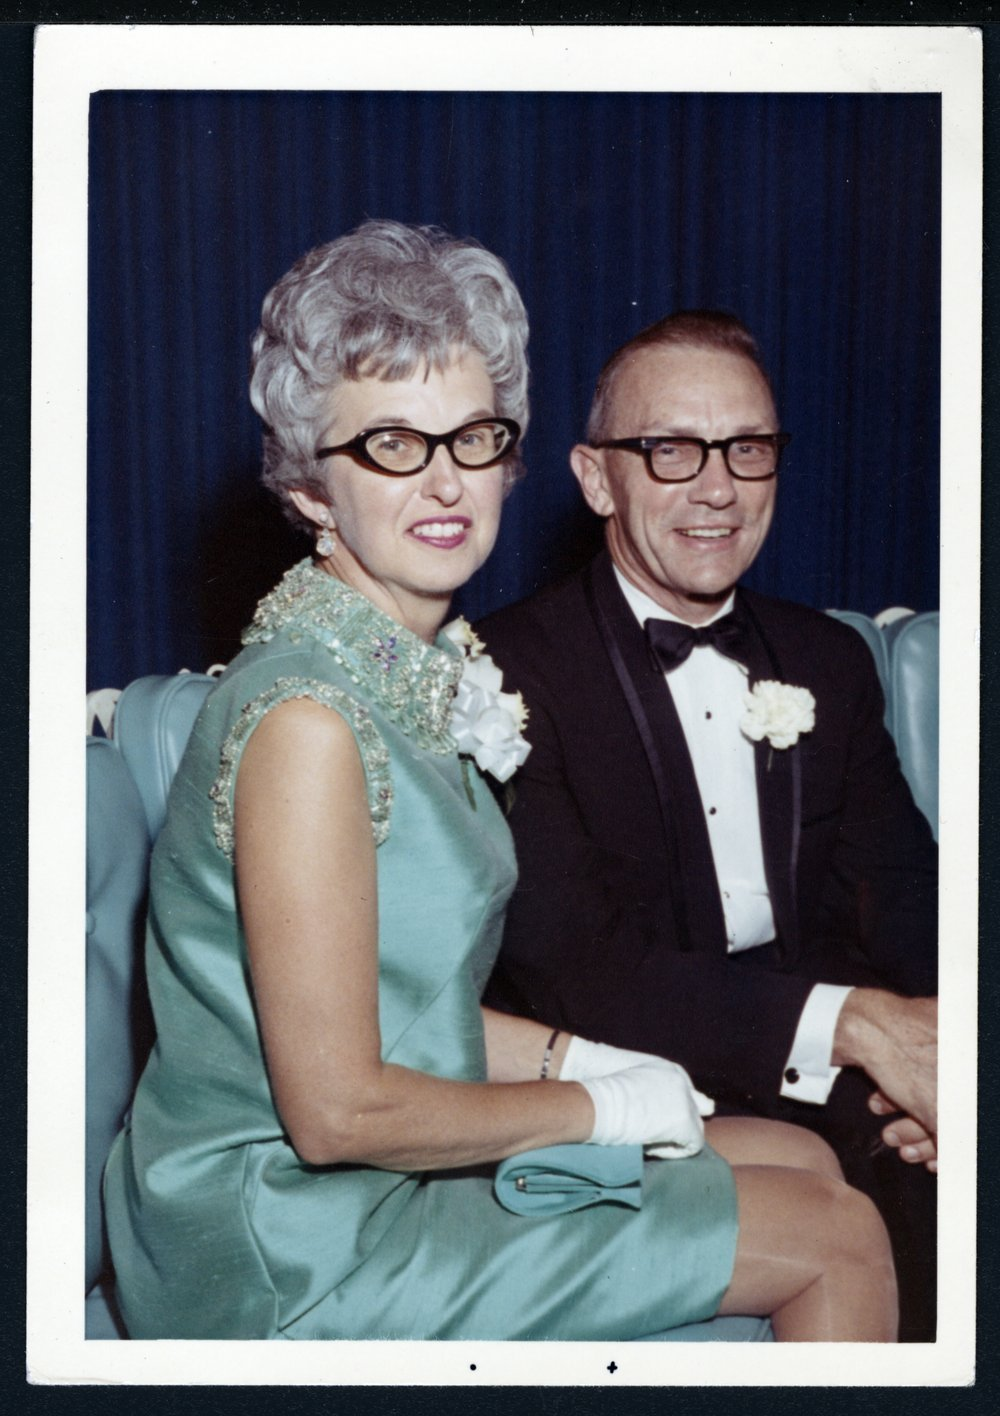 Dr. John and Marion Reynolds